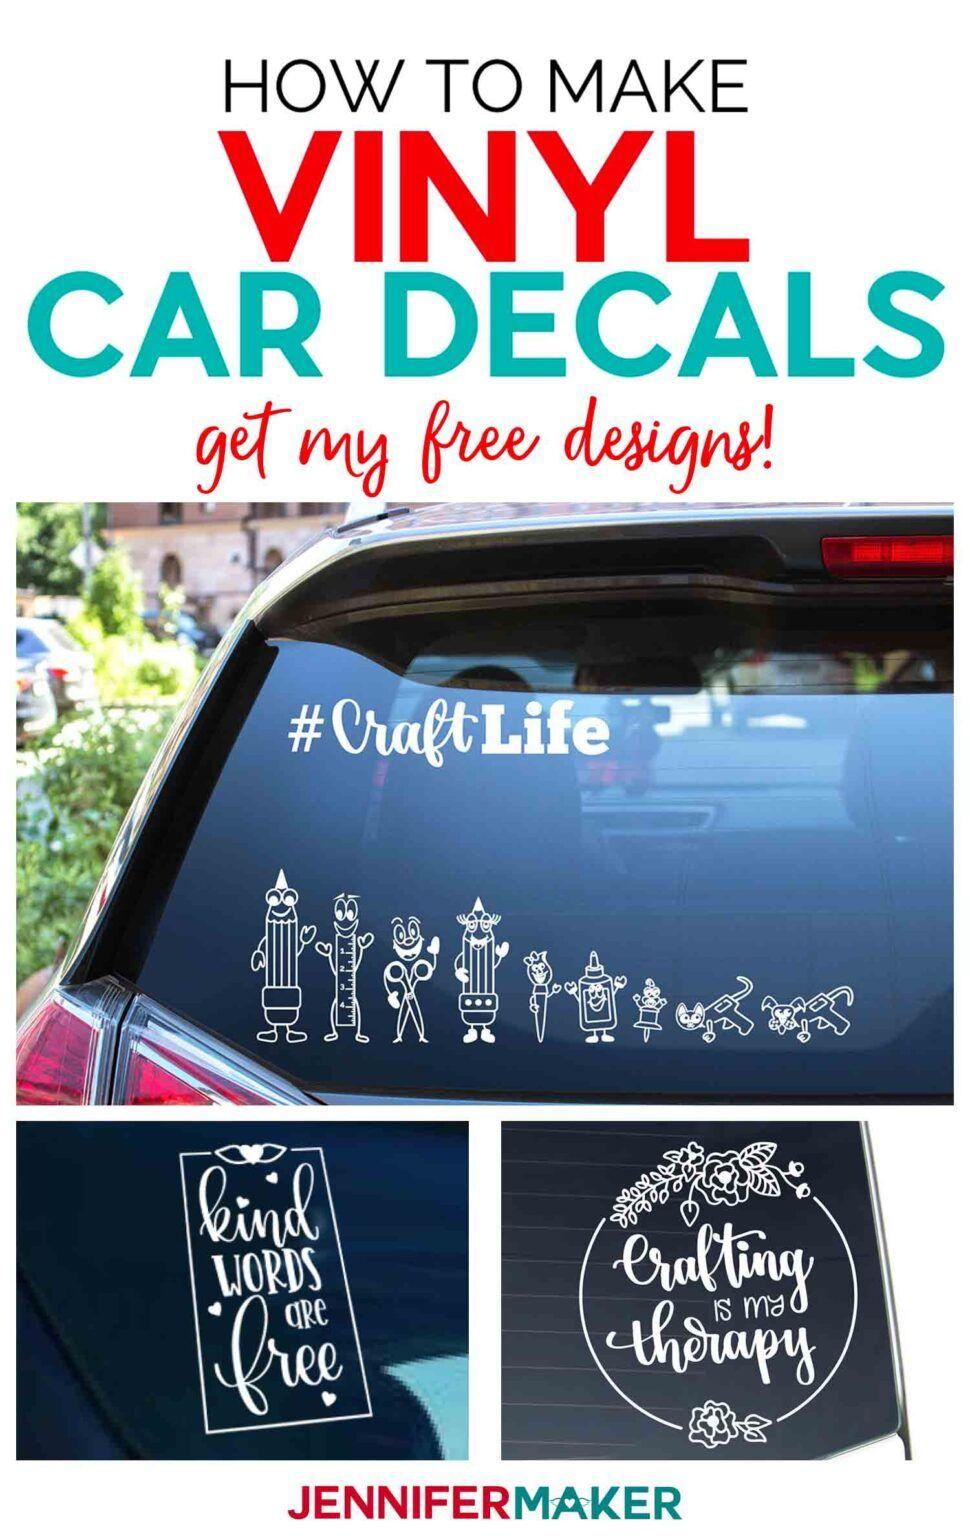 Vinyl Car Decals Quick And Easy To Make Your Own Jennifer Maker Car Decals Vinyl Cricut Projects Vinyl Cricut Vinyl